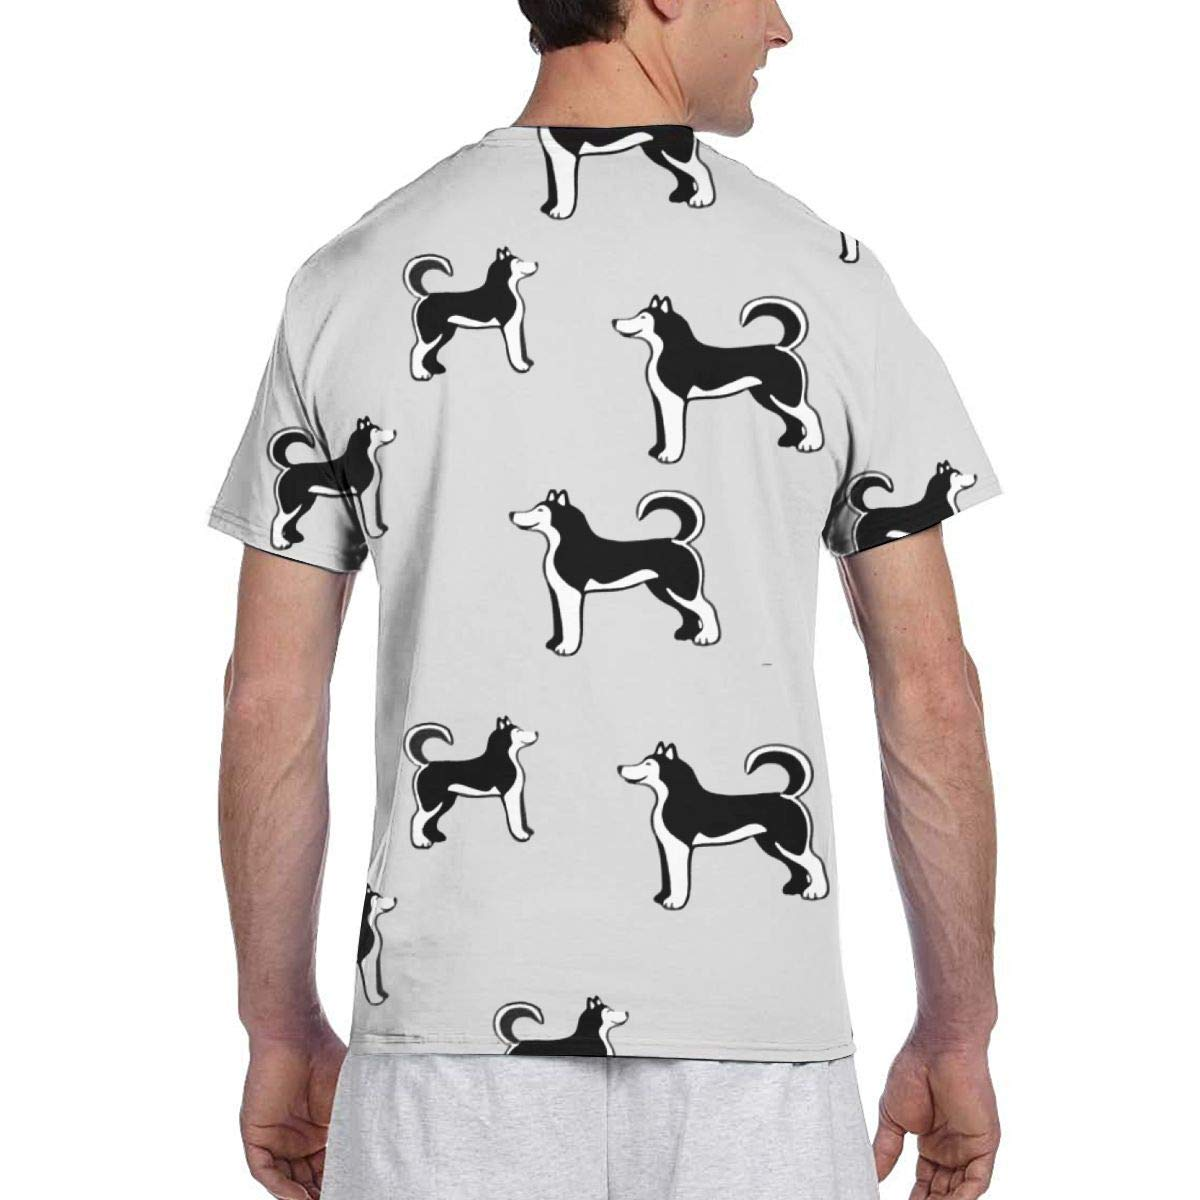 EricJohnston Siberian Husky Dog Men Camiseta de Manga Corta ...